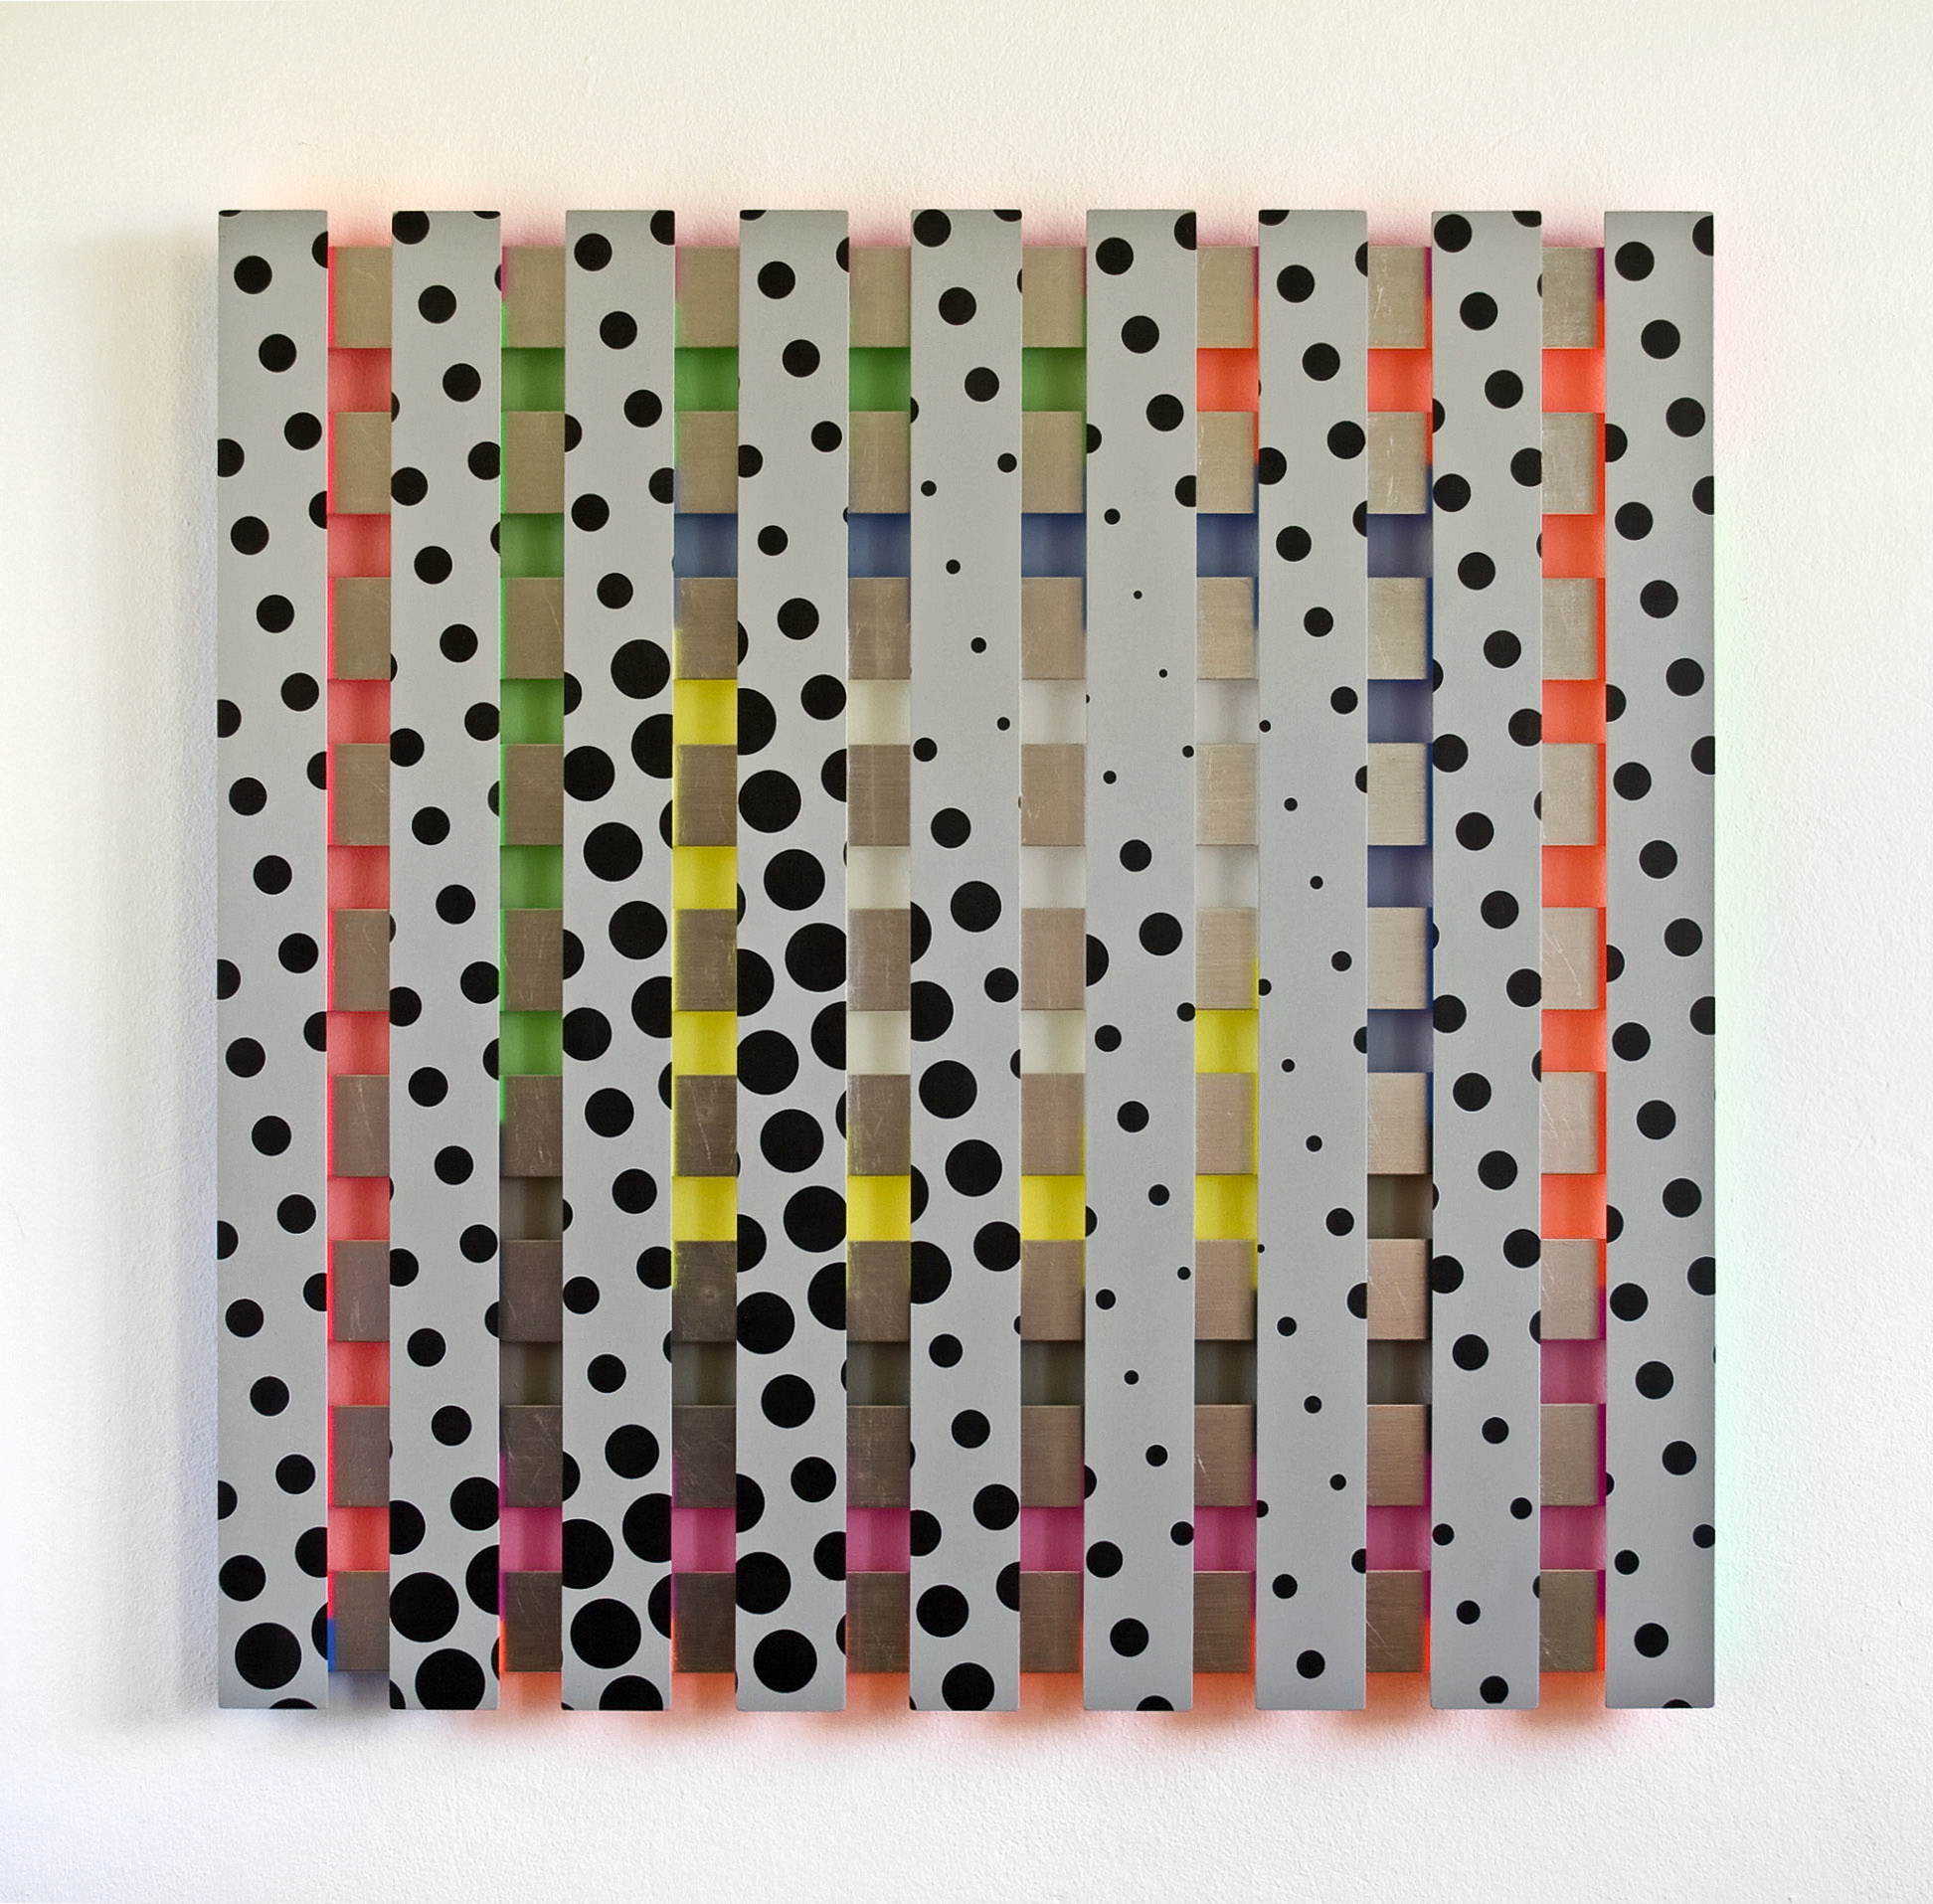 3e akril, les, 121 x 121 cm, 2010.jpg